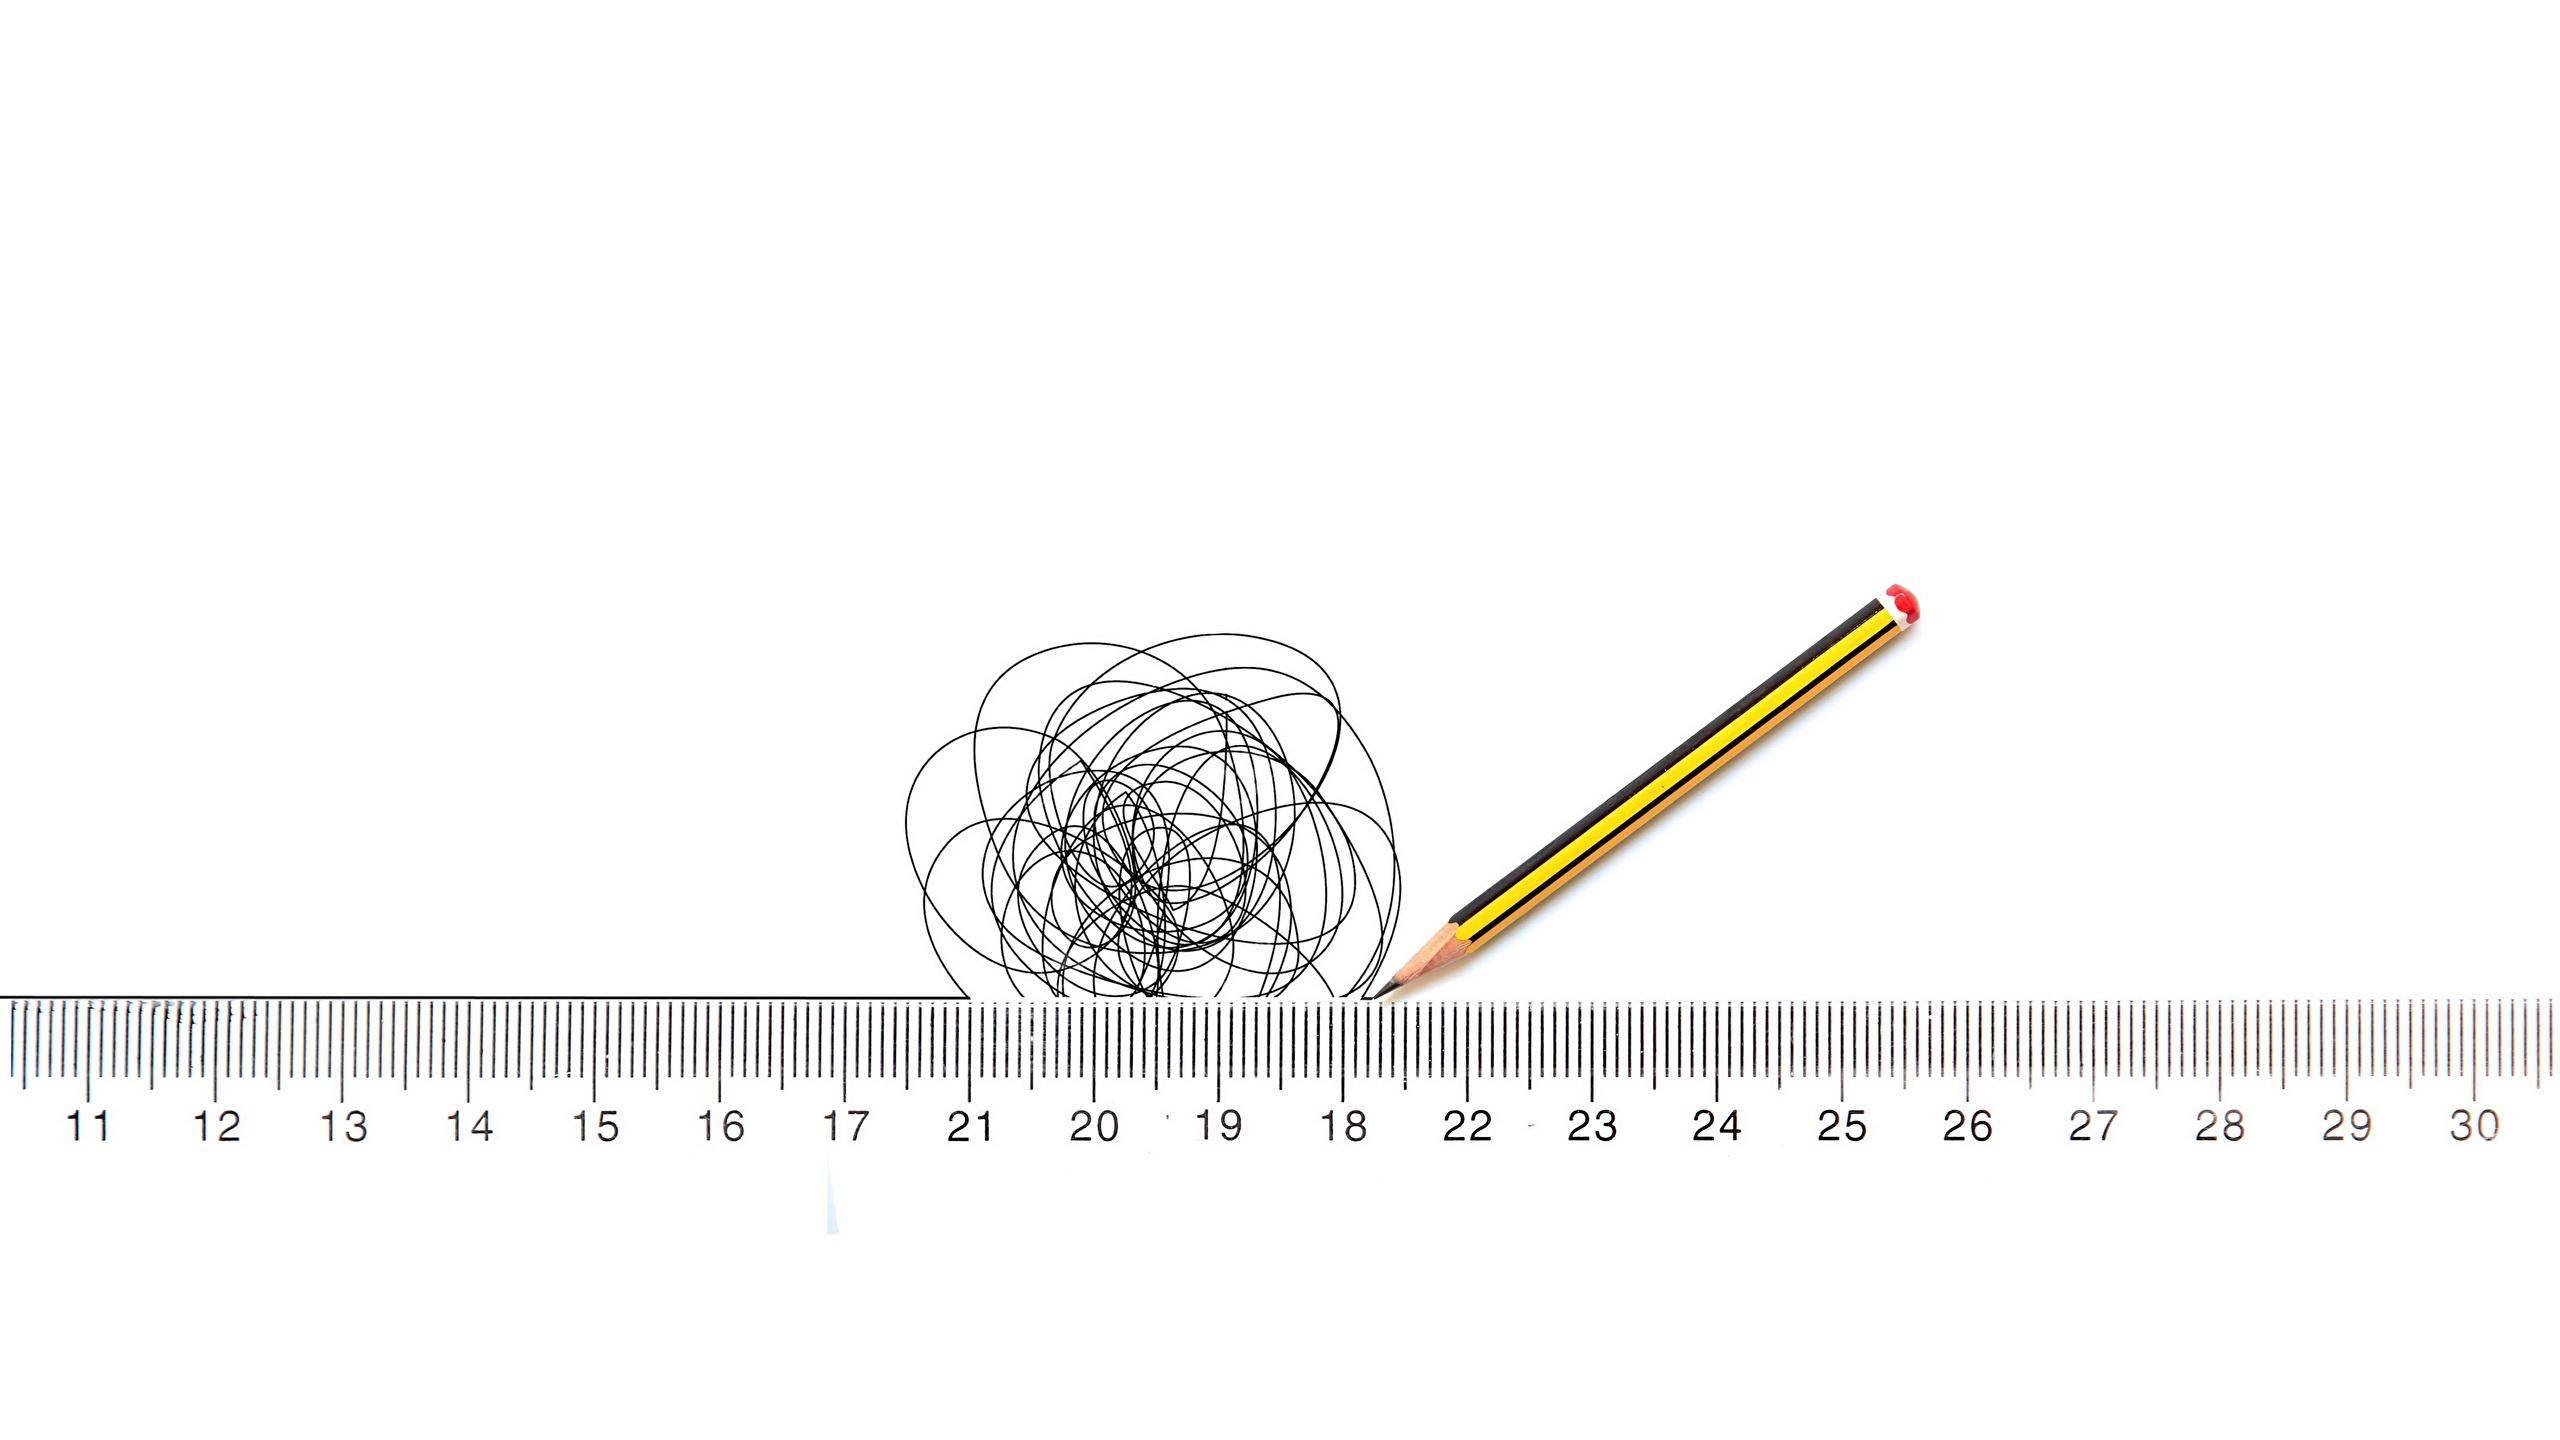 Fonds D Ecran 2560x1440 Crayon Fond Blanc Telecharger Photo